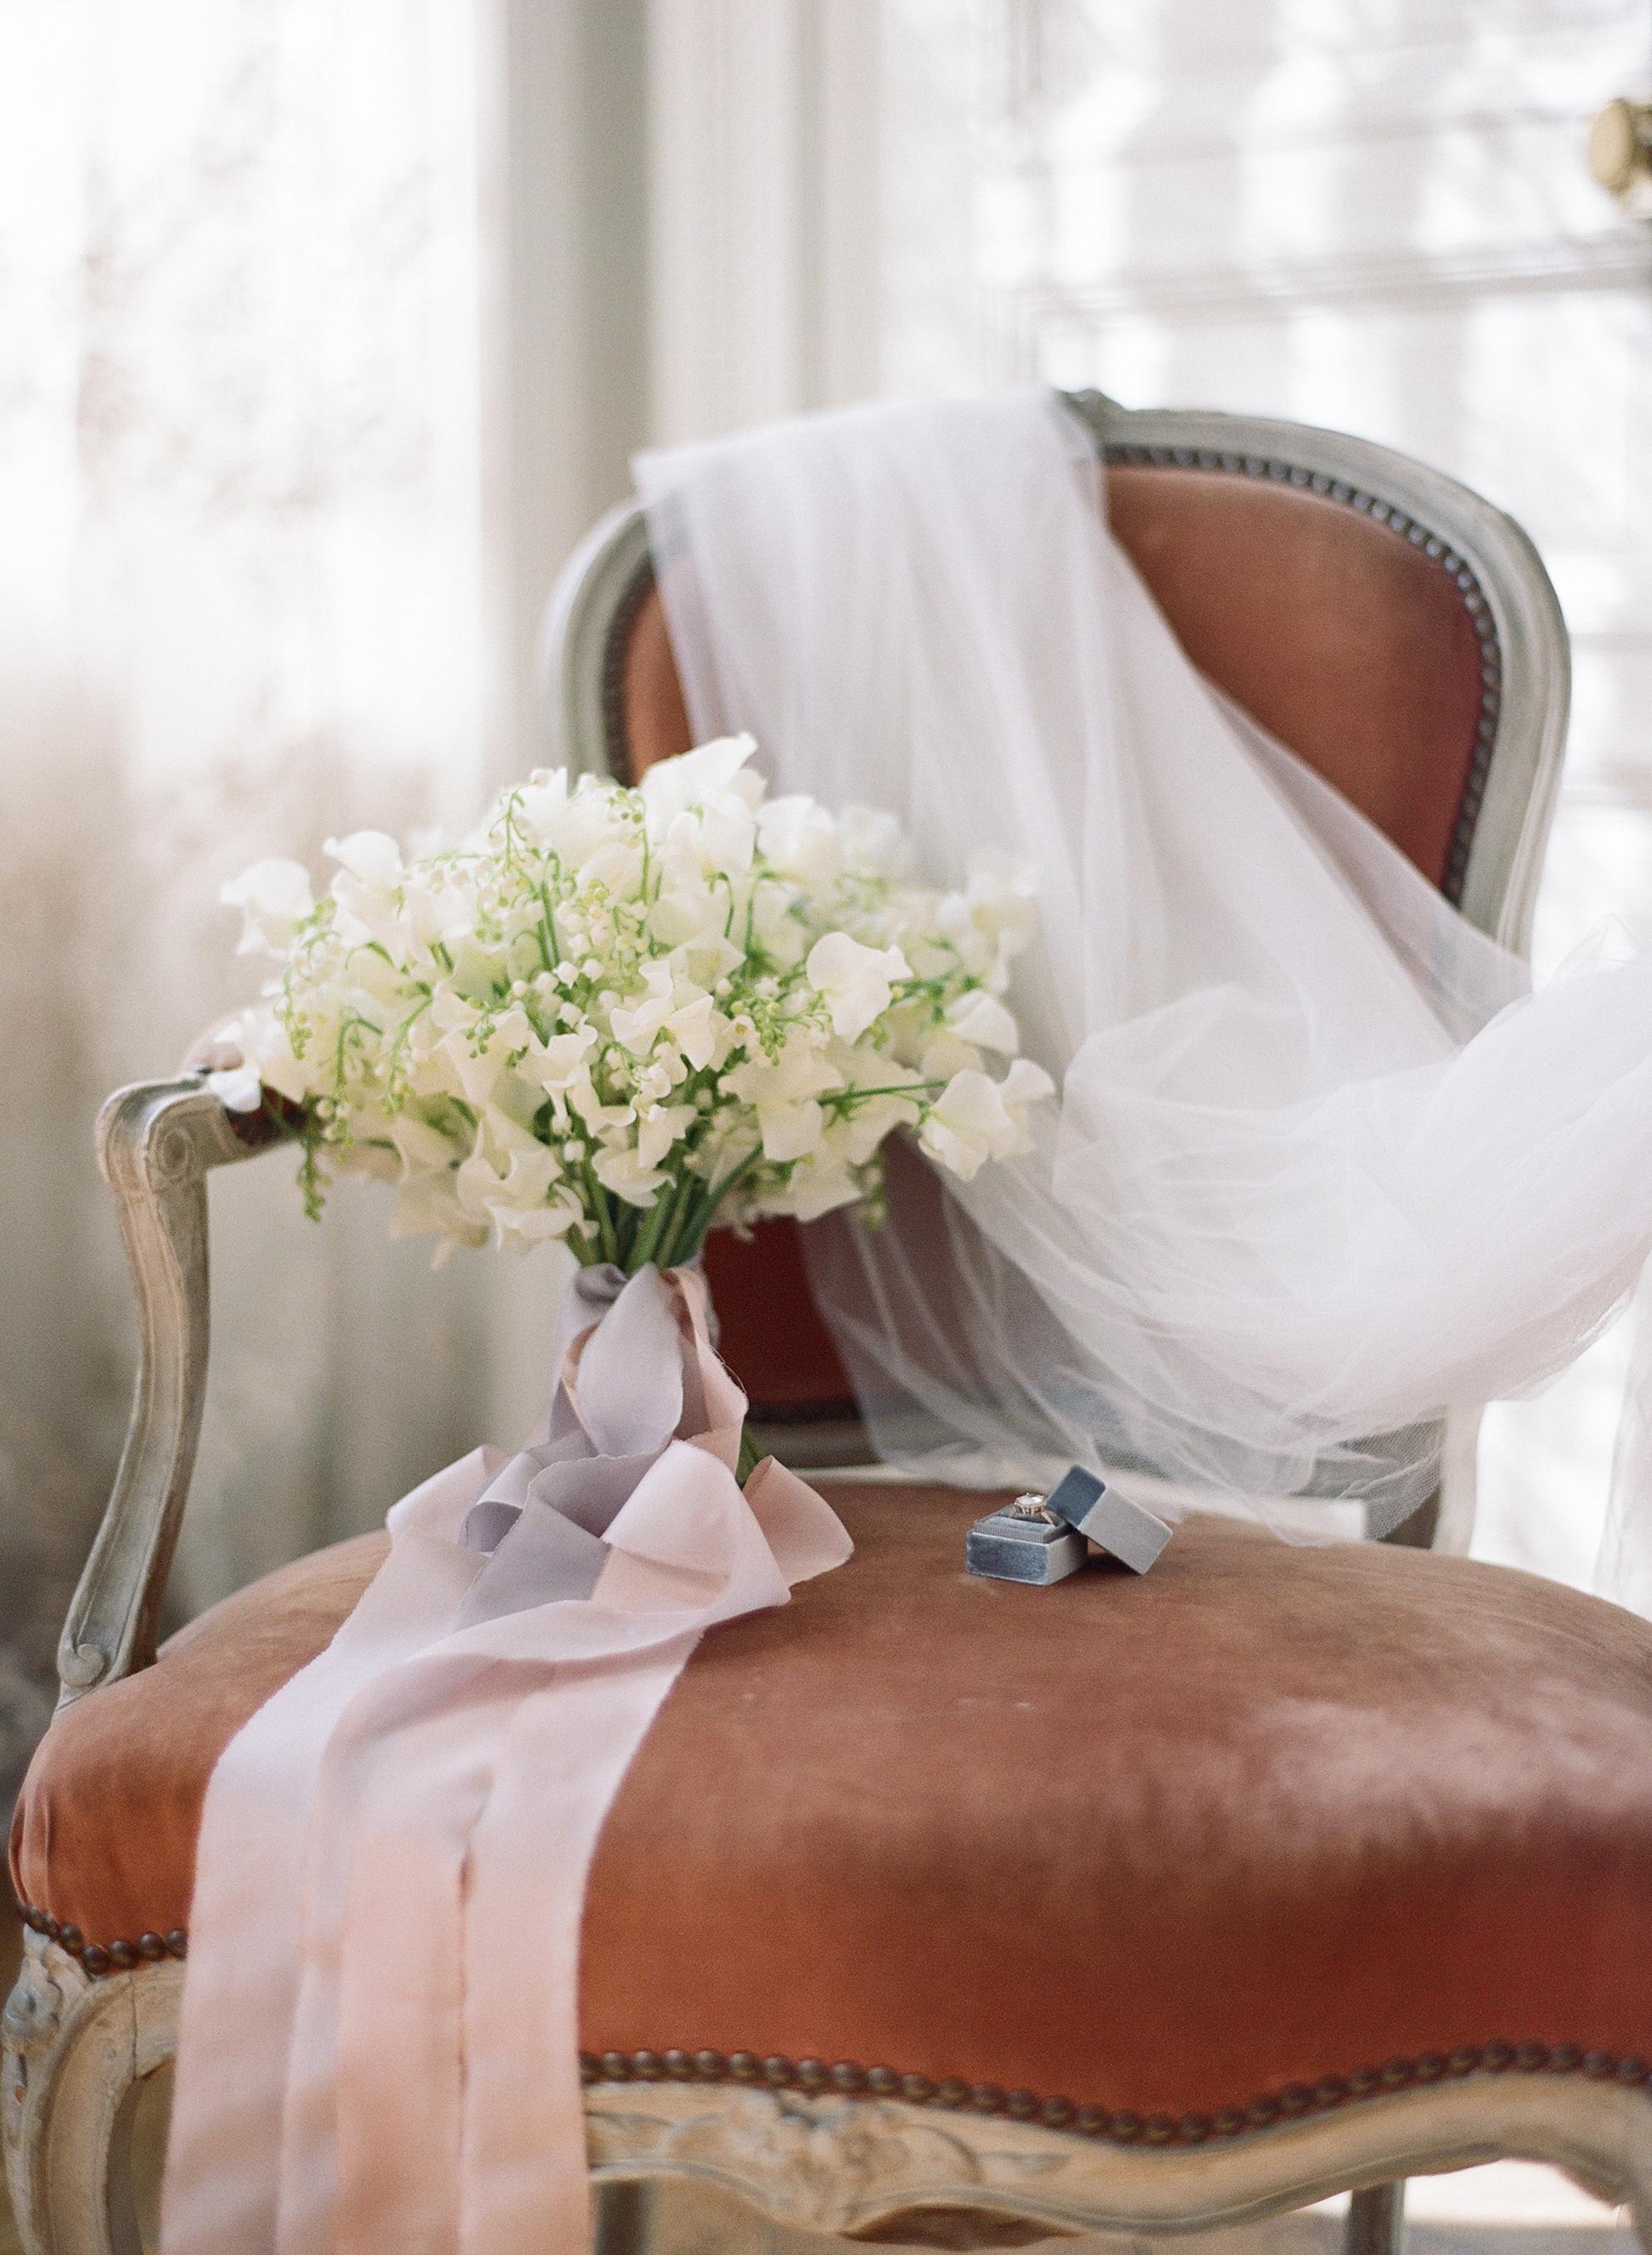 Sylvie-Gil-film-destination-wedding-photography-2017-workshop-chateau-de-varennes-masquerade-burgundy-france-bouquet-rings-tulle